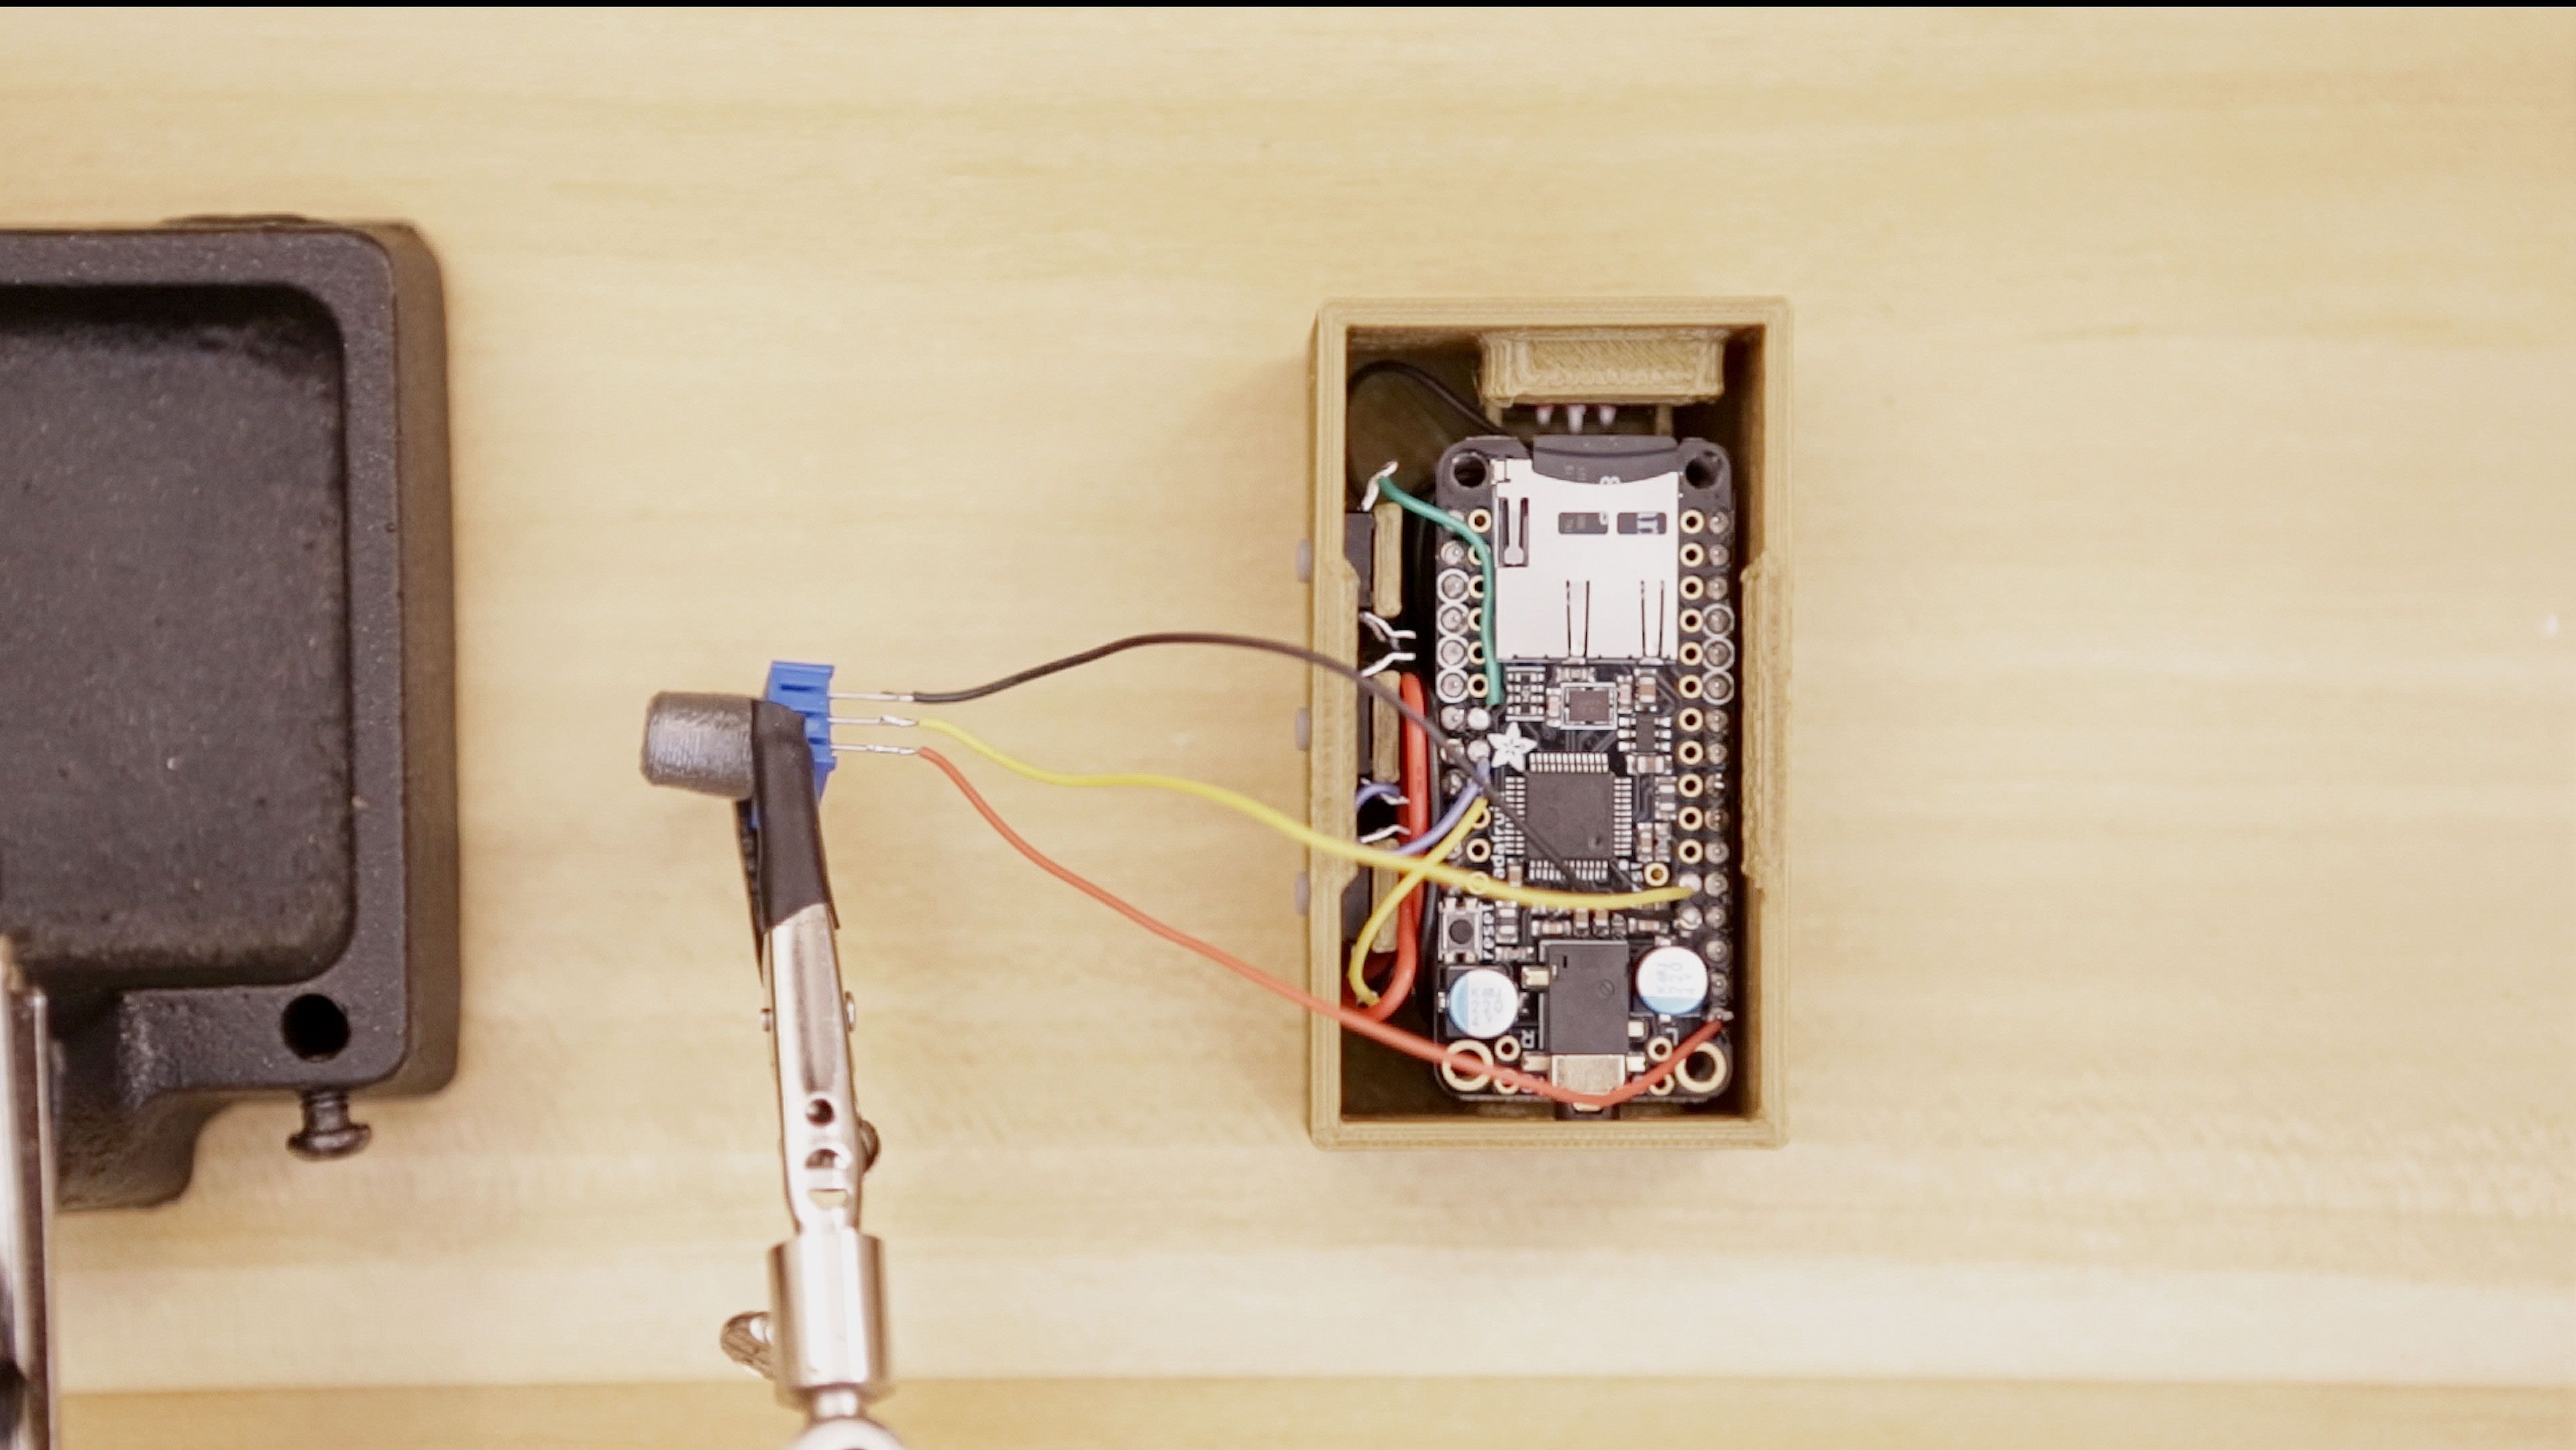 3d_printing_knob-solder-board.jpg